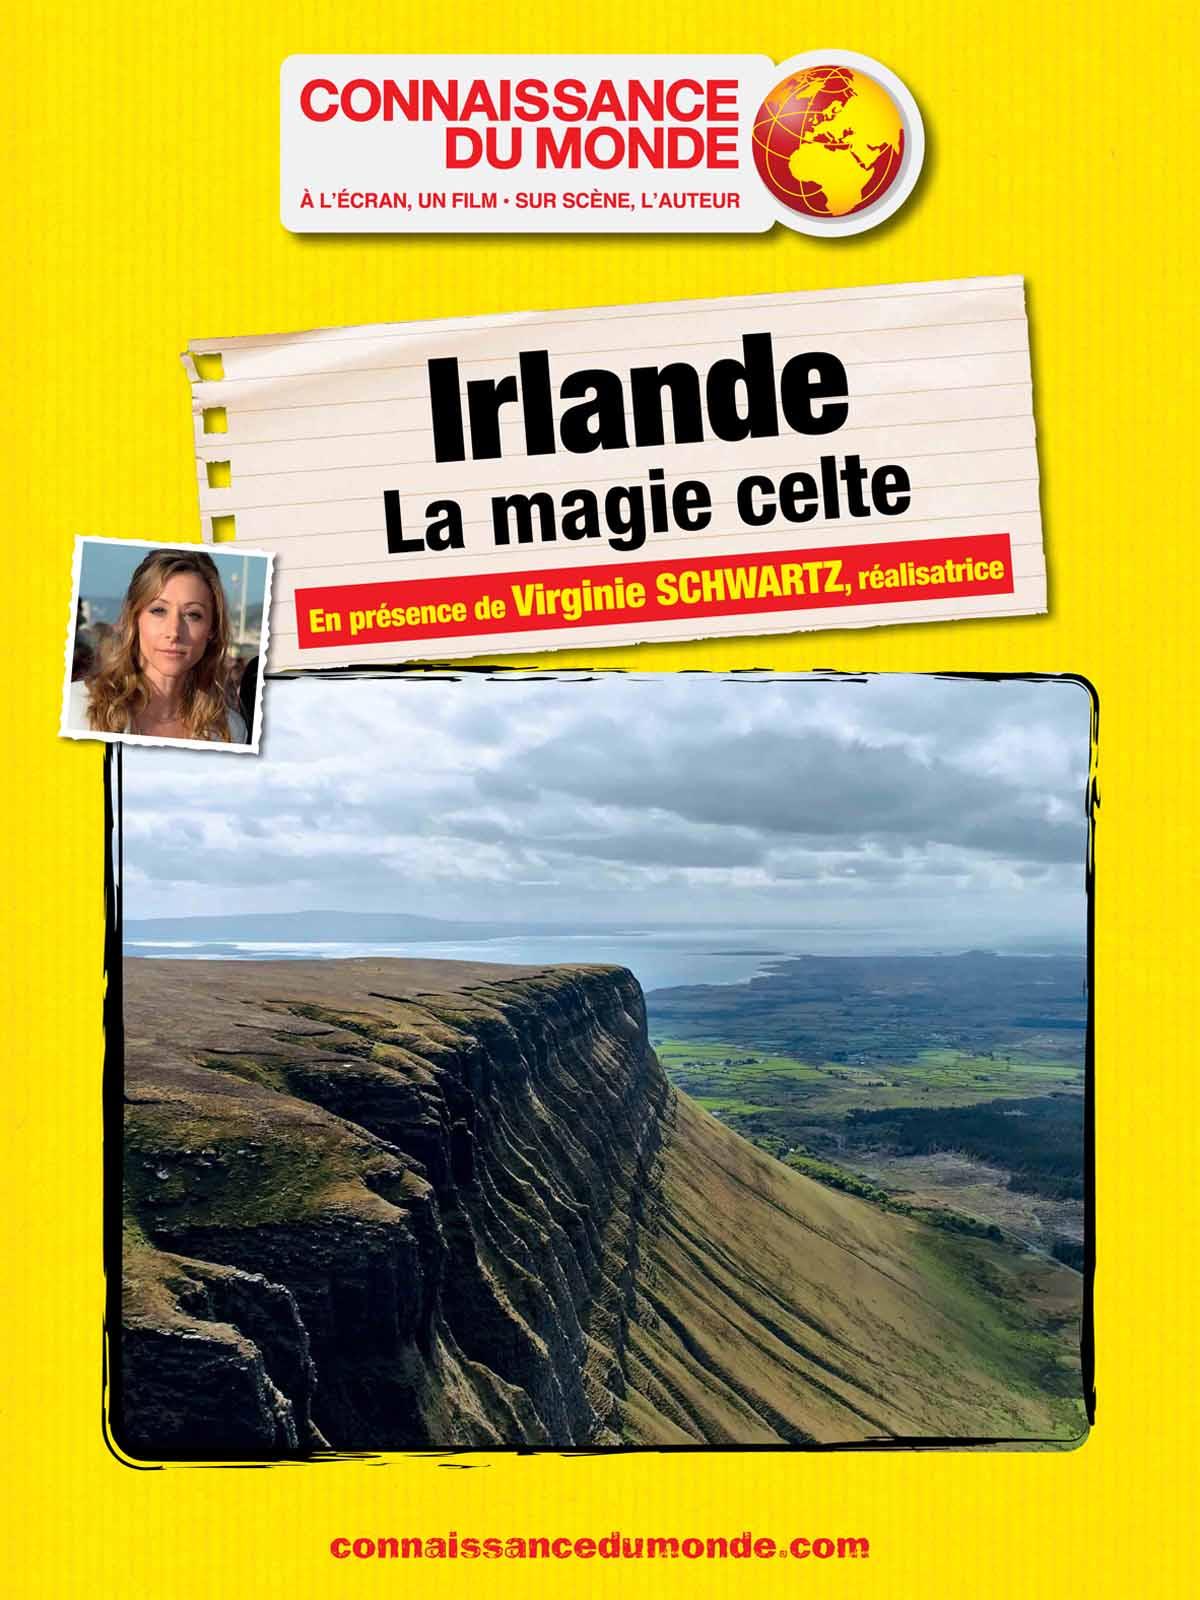 IRLANDE, La magie celte - film 2018 - AlloCiné